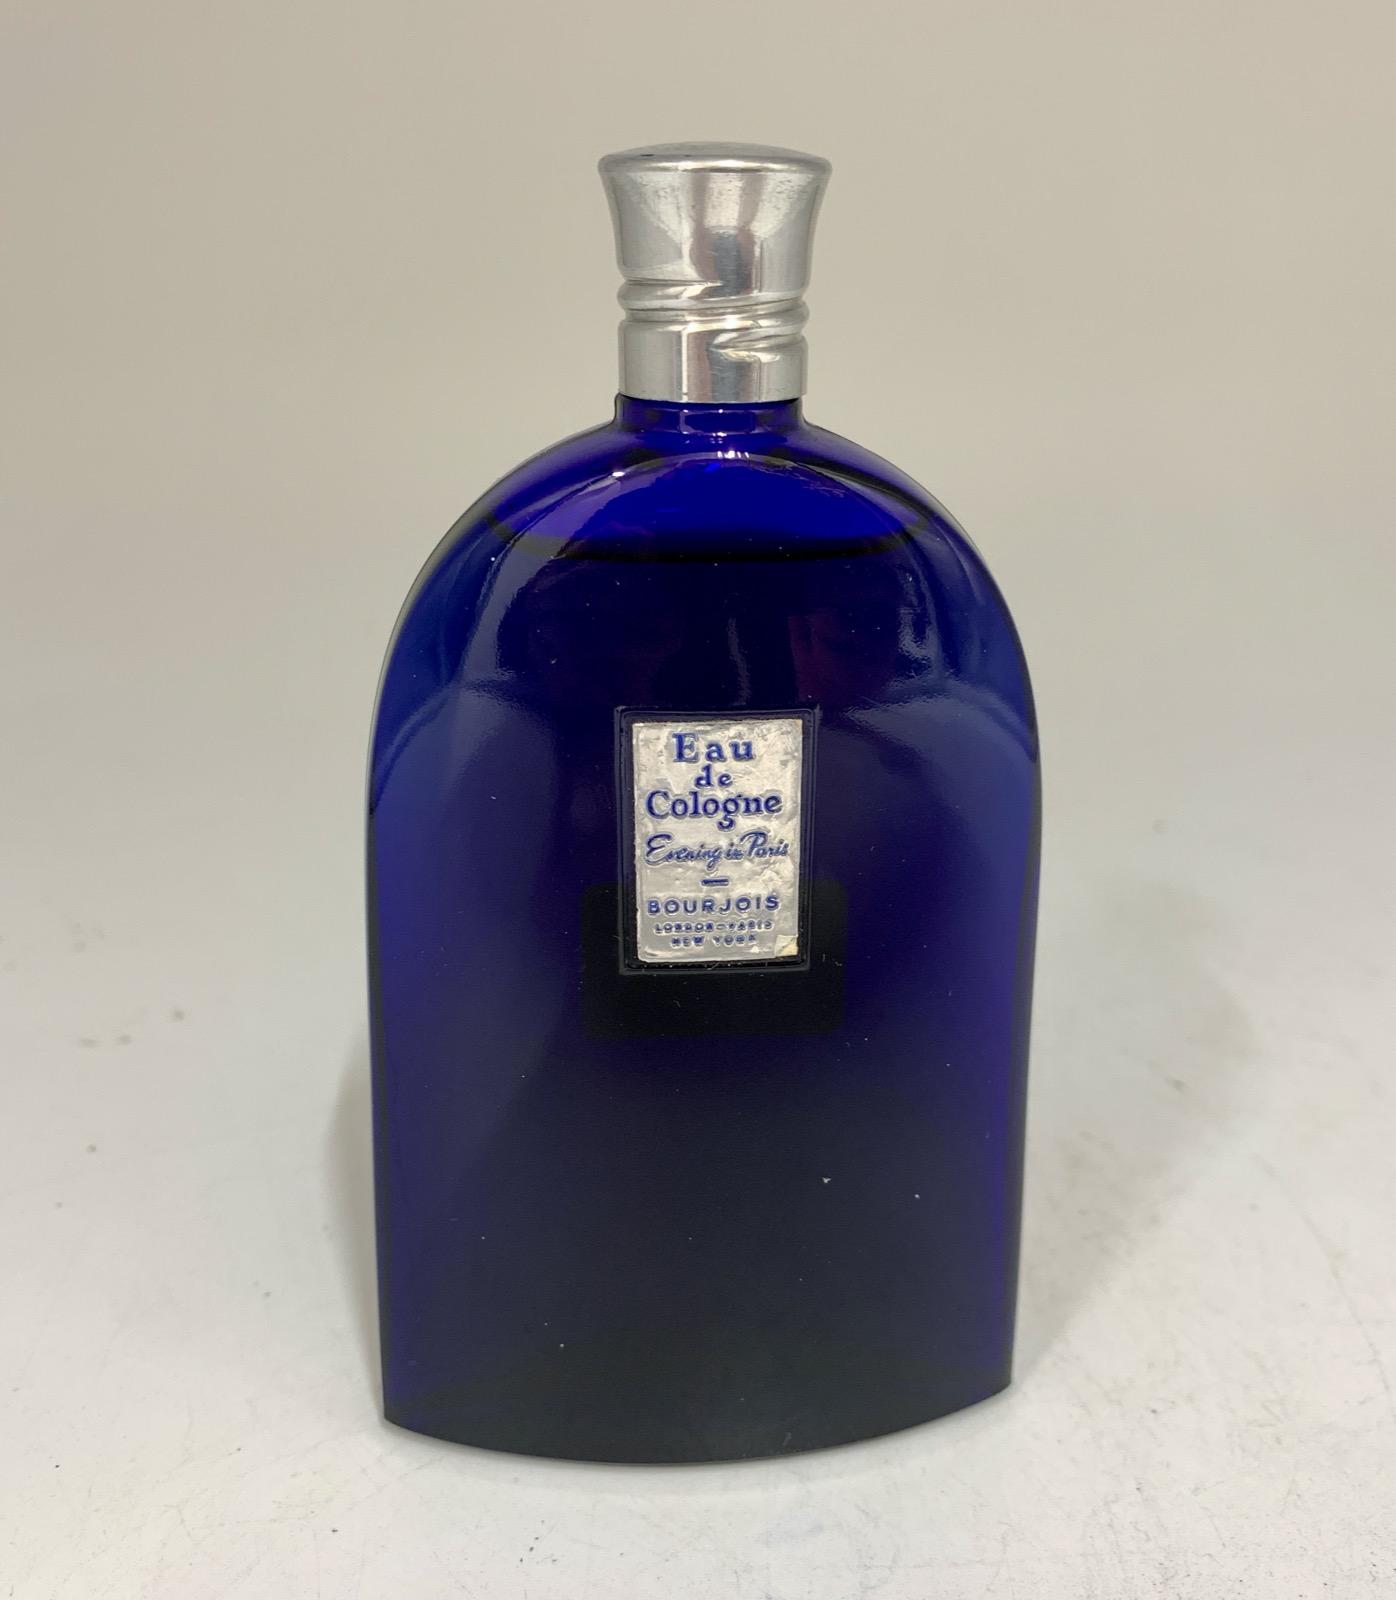 Vintage Evening in Paris perfume bottle